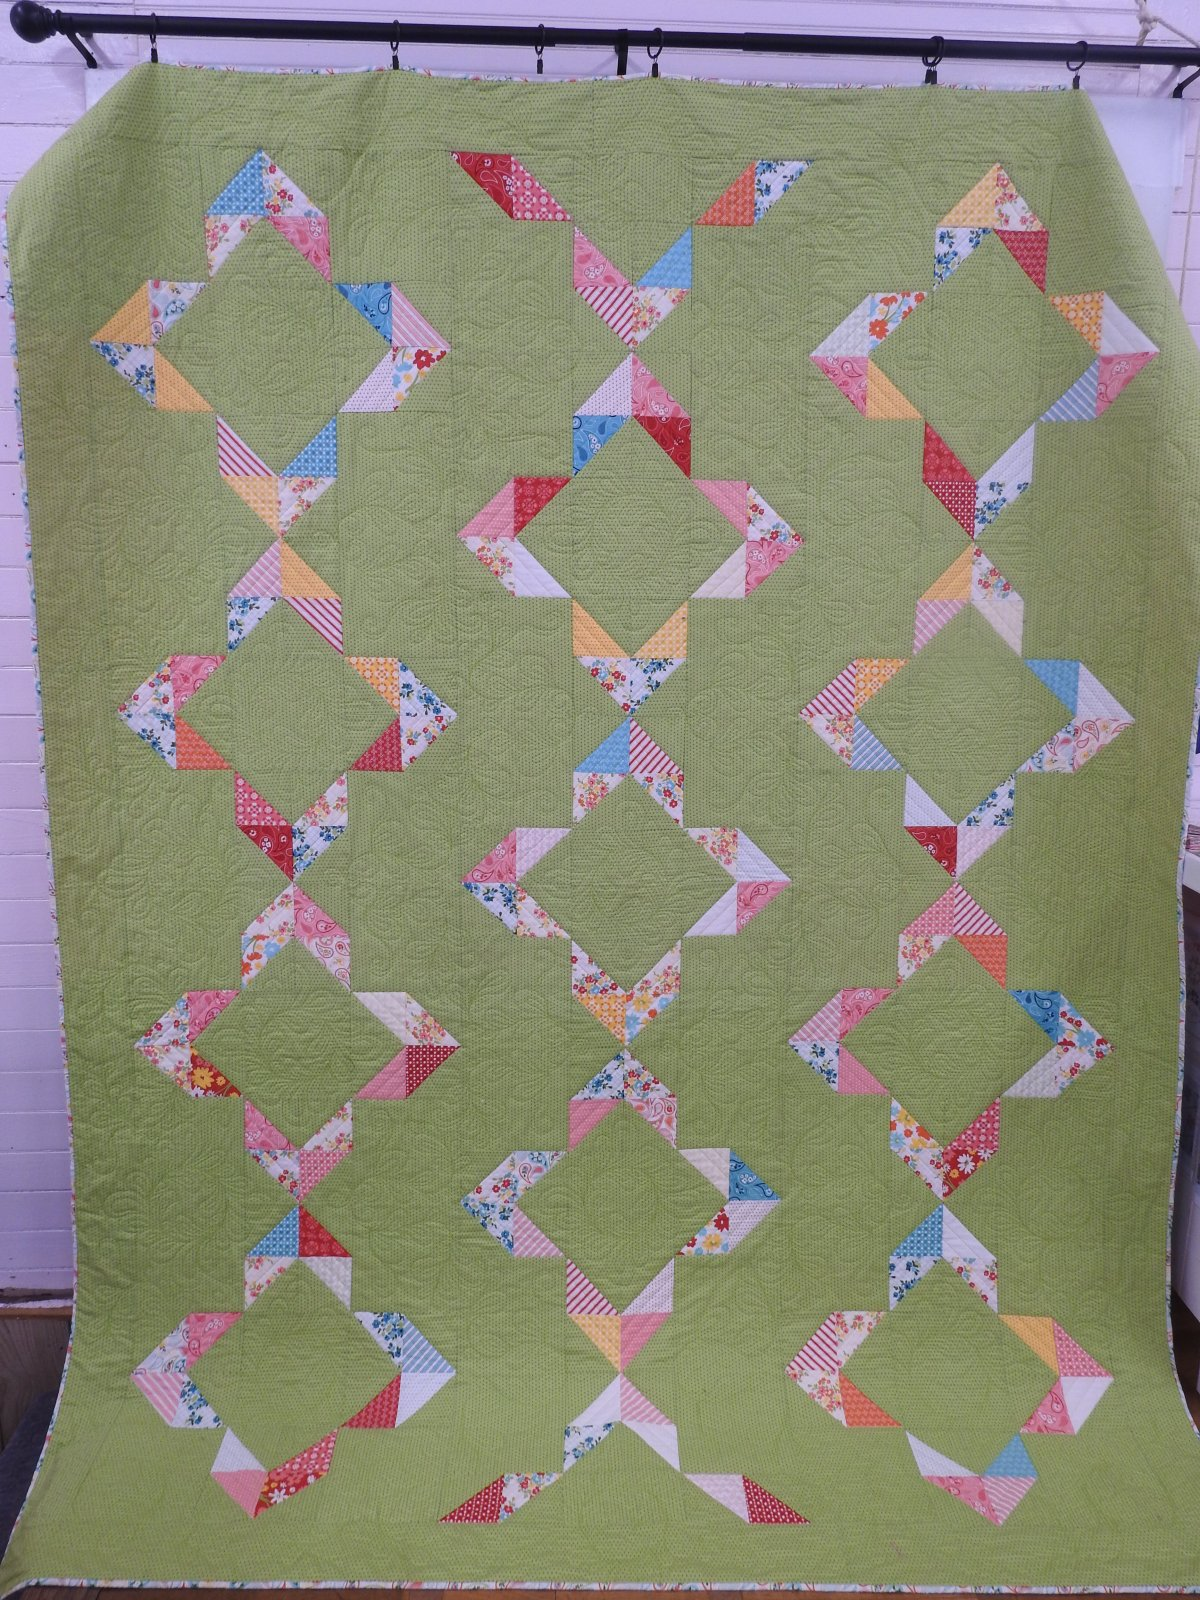 Spring Fling 91 x 105.5